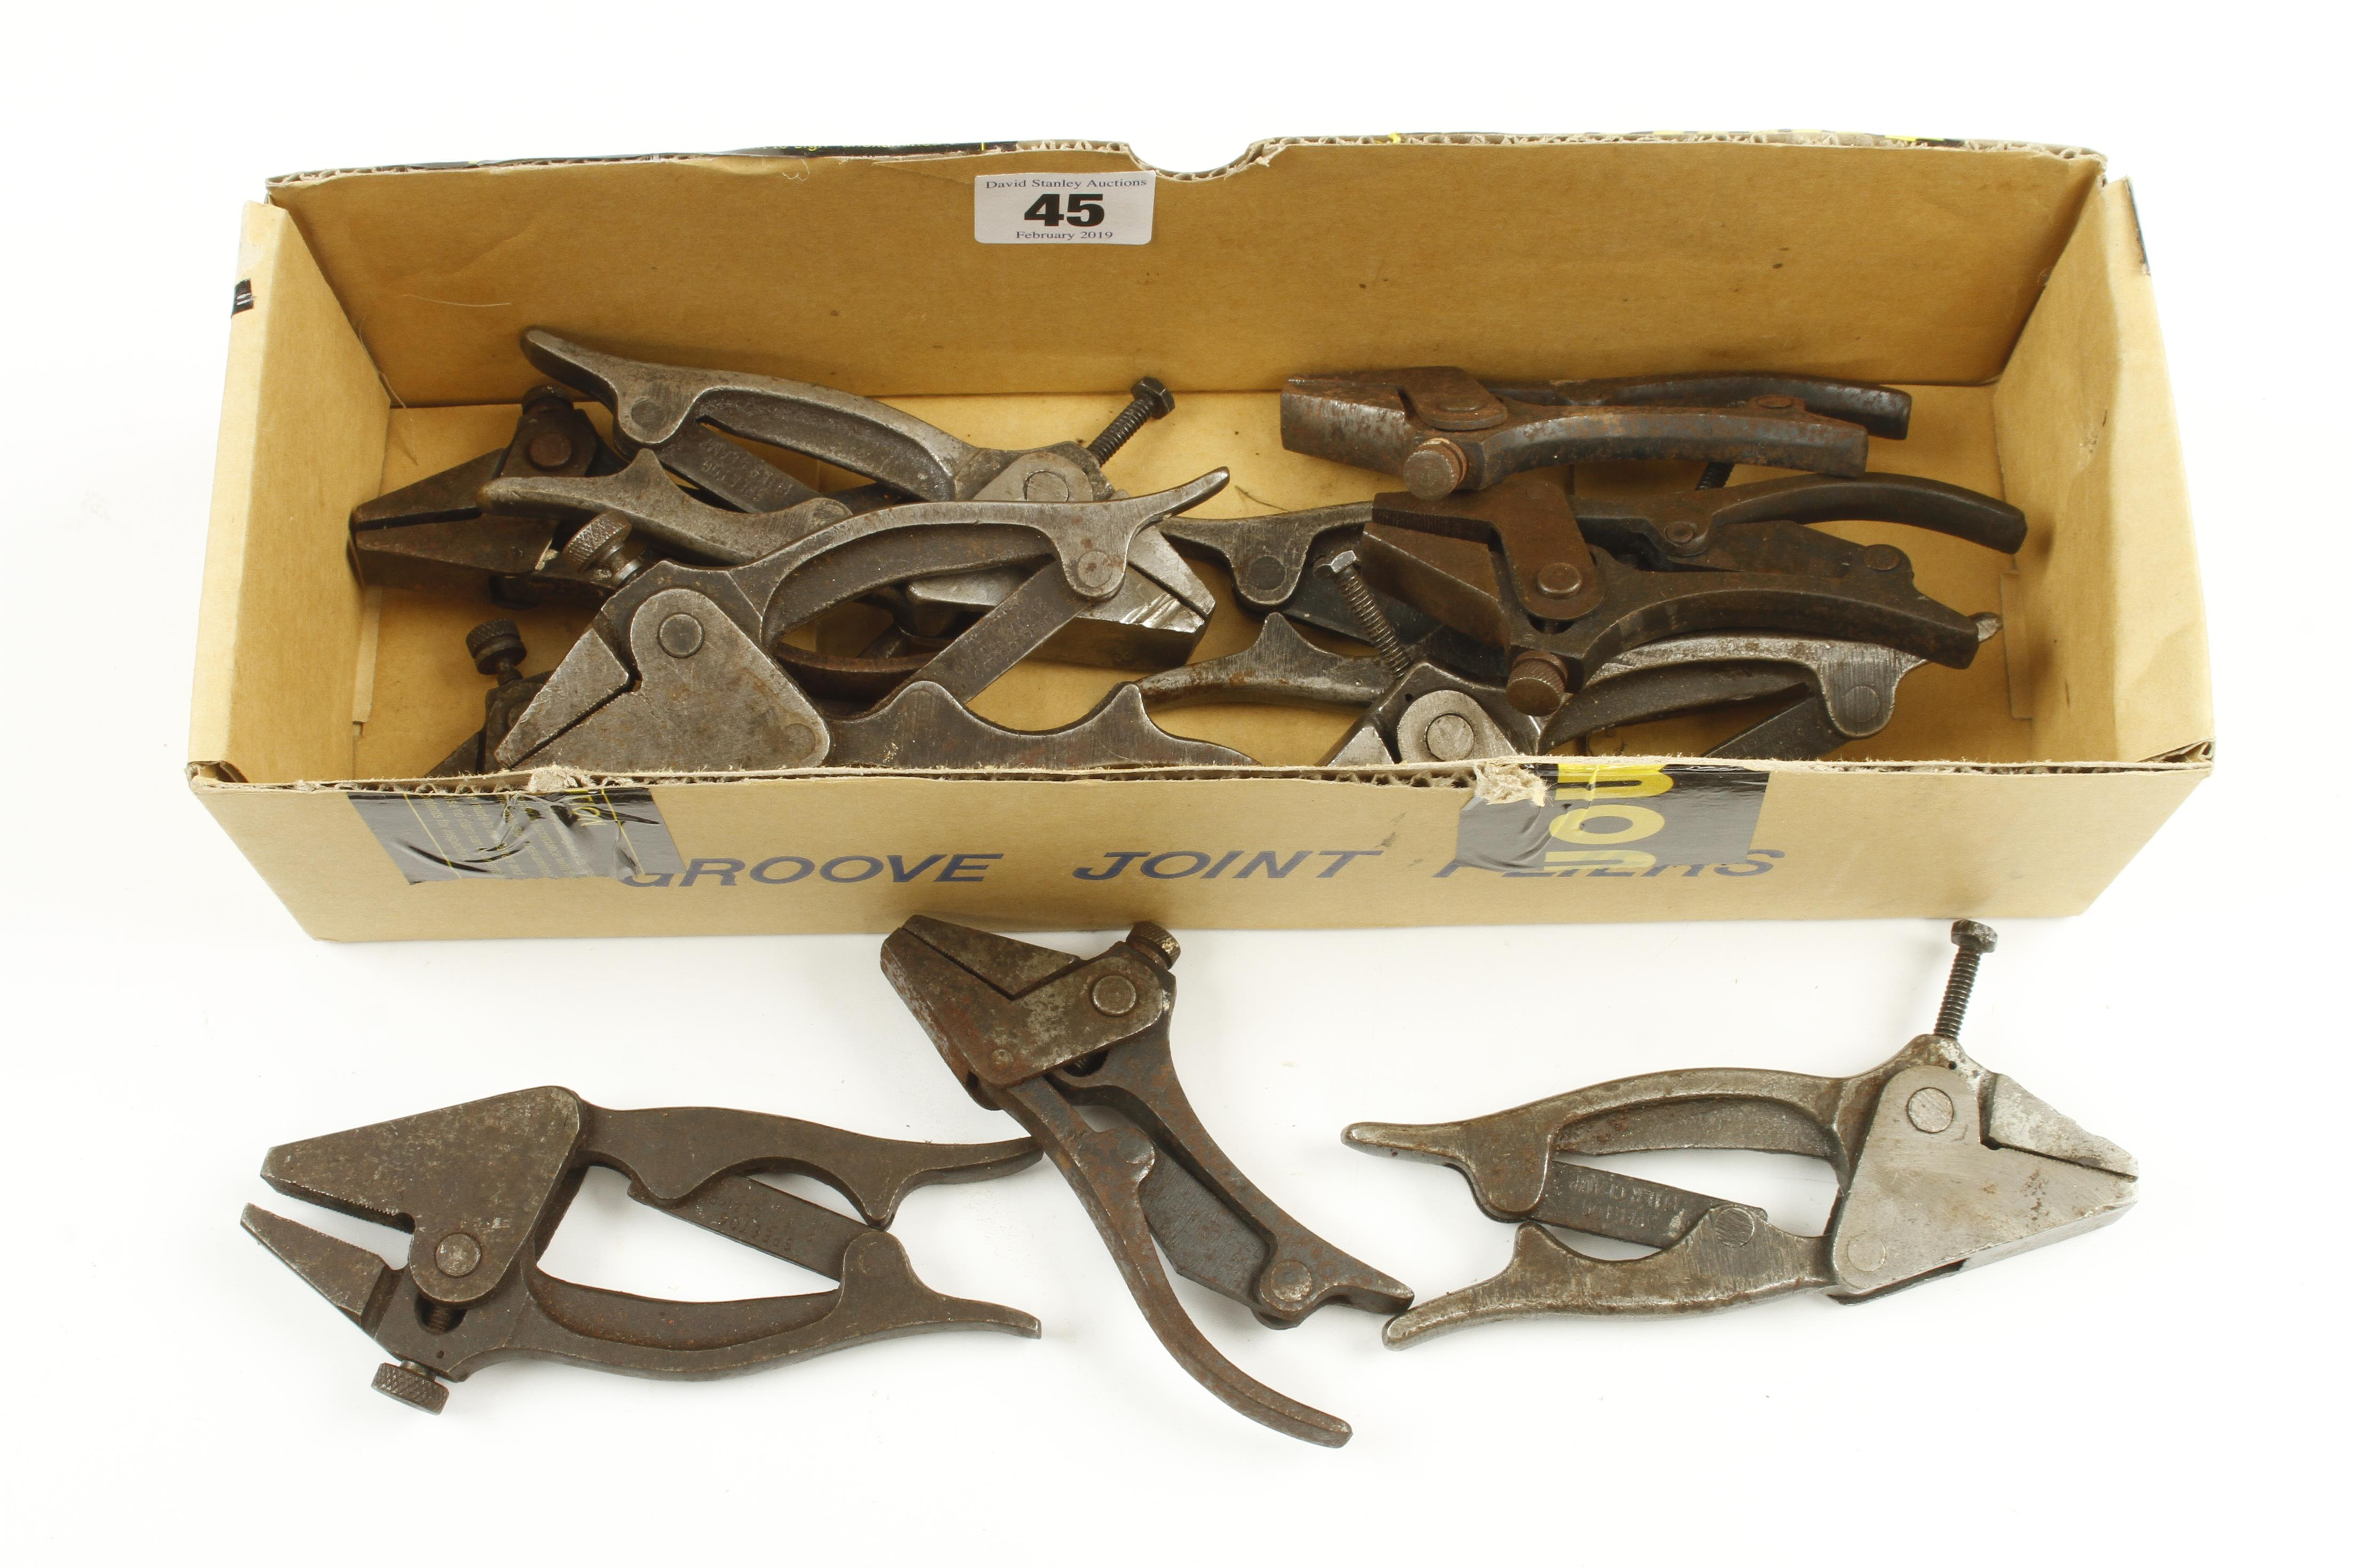 Lot 45 - 11 SPEETOG plier clamps G